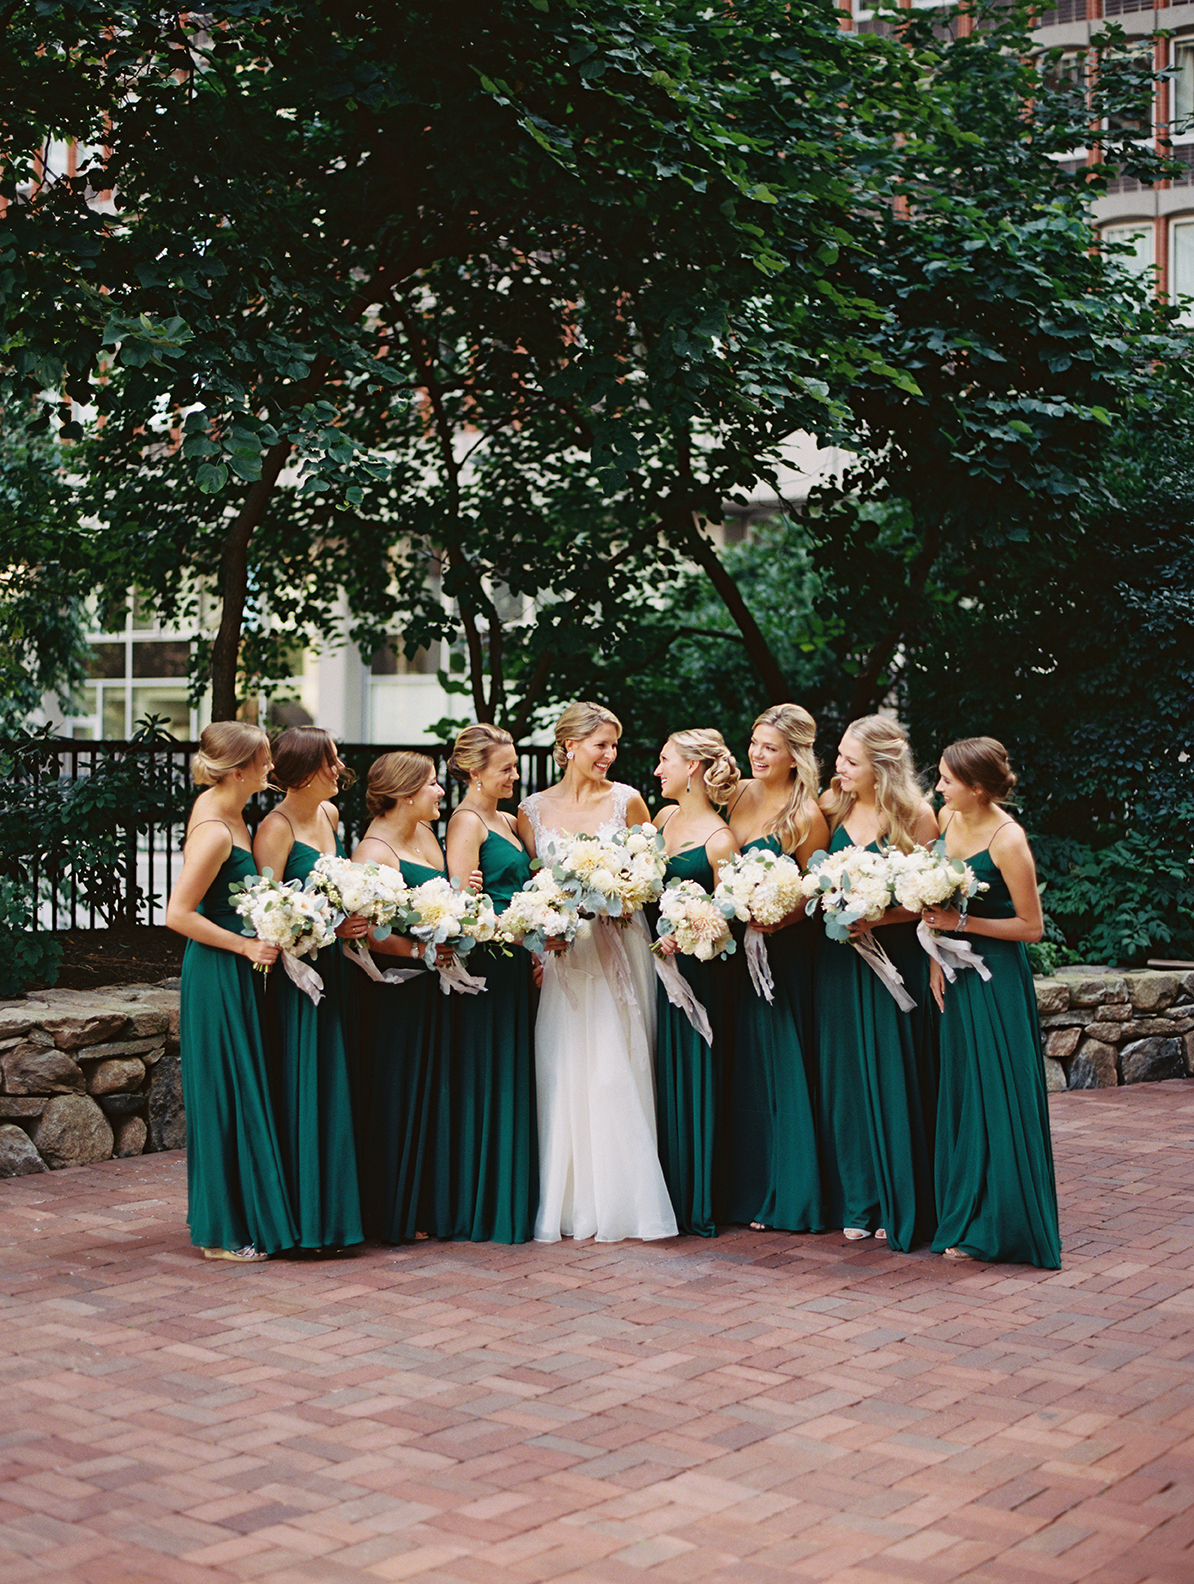 207-andrew-megan-boston-public-library-wedding-film-photographer.jpg